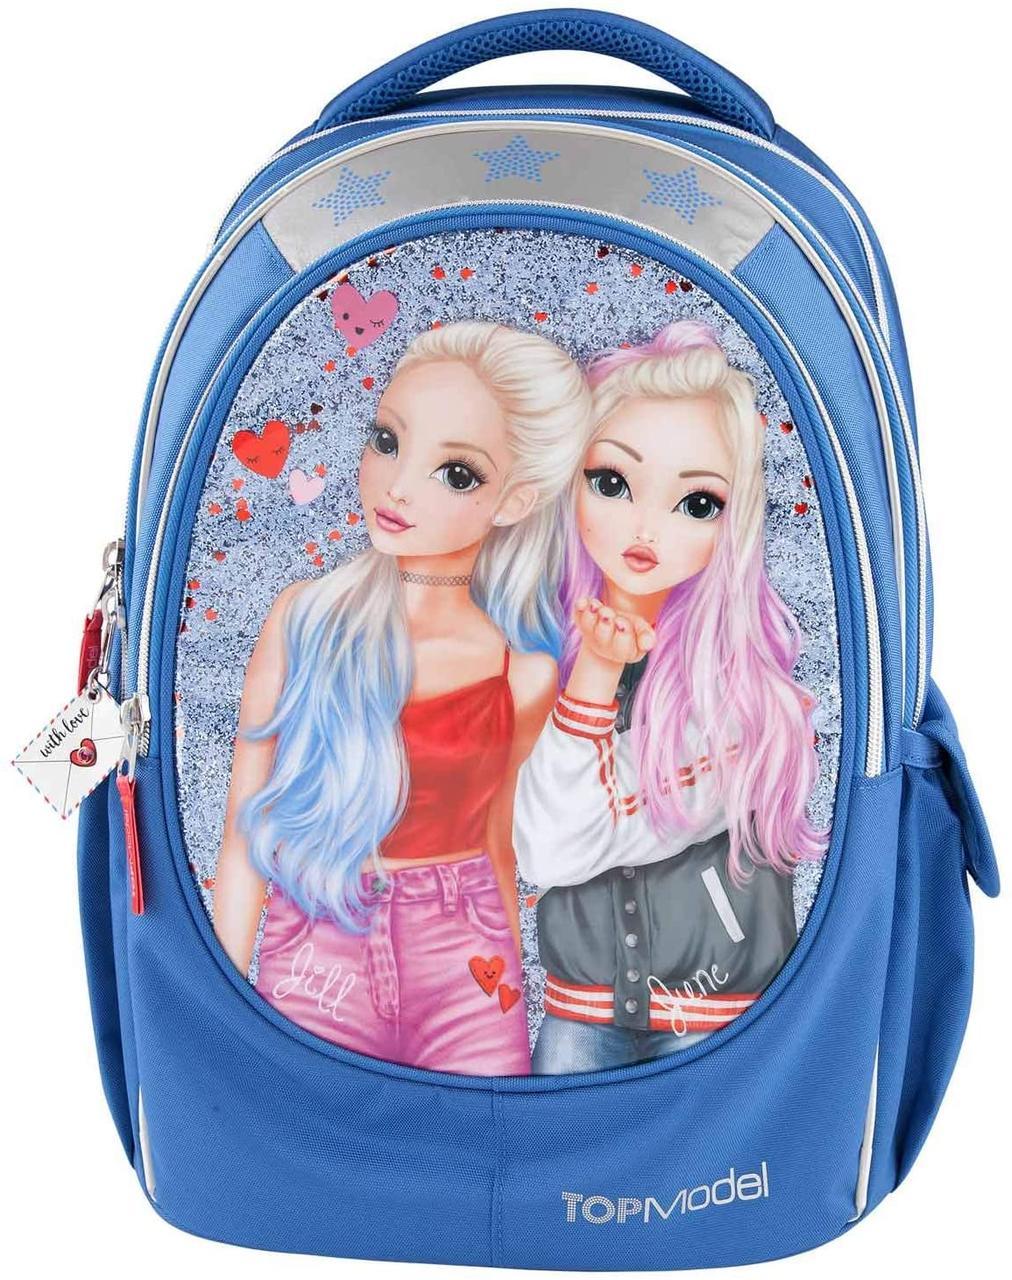 Top Model Depesche Шкільний рюкзак Top Model Friends June & Jill синій (Шкільний портфель Топ Модел Друзі)